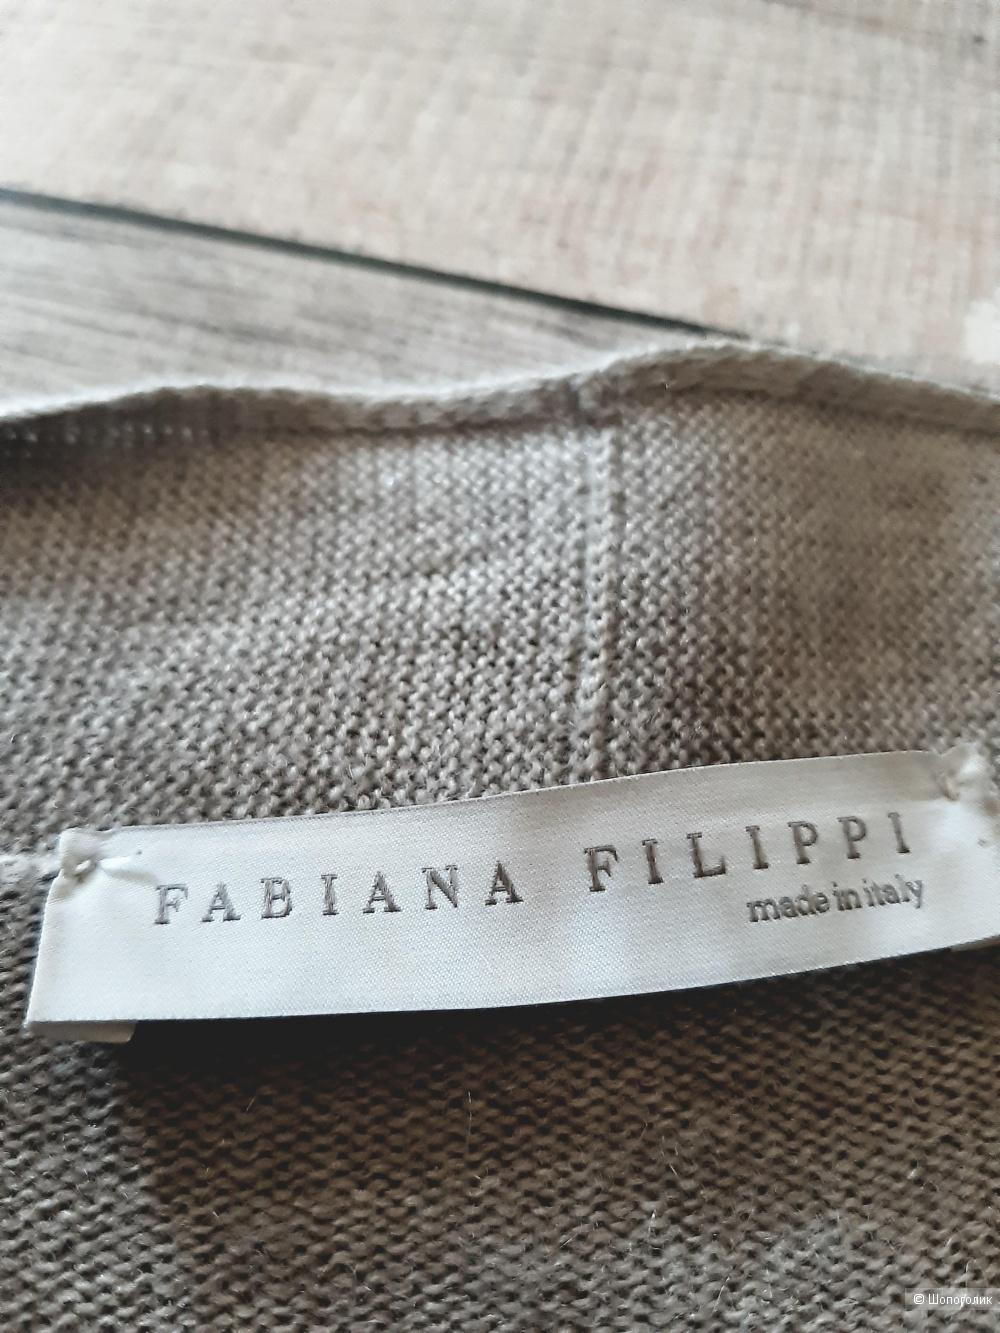 Кардиган Fabiana Filippi, песочный, размер М